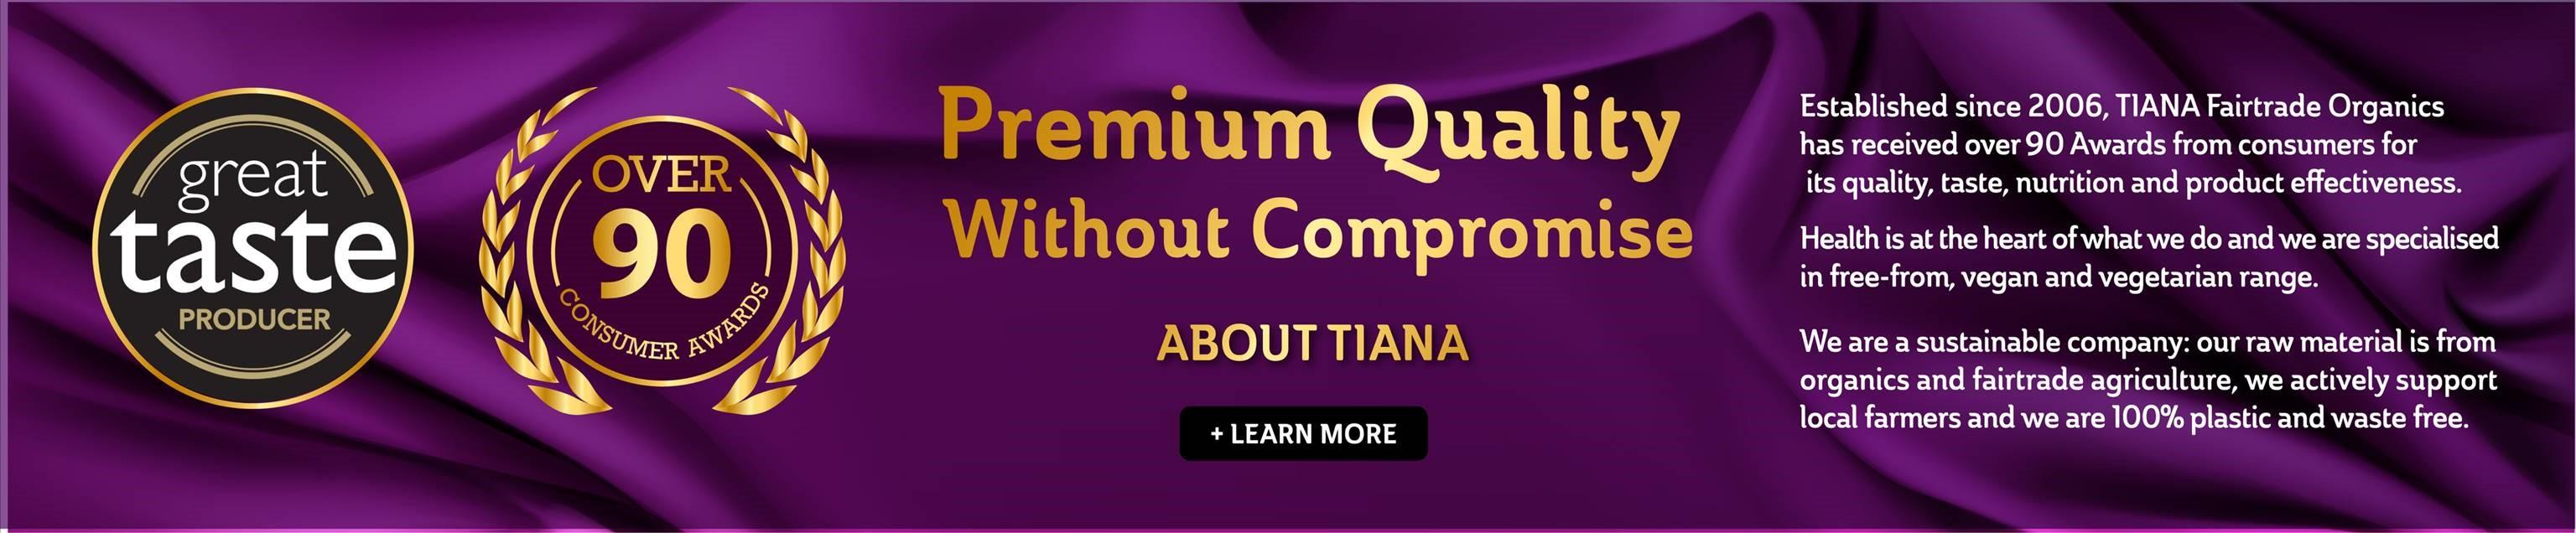 the world's premier tiana fairtrade organics